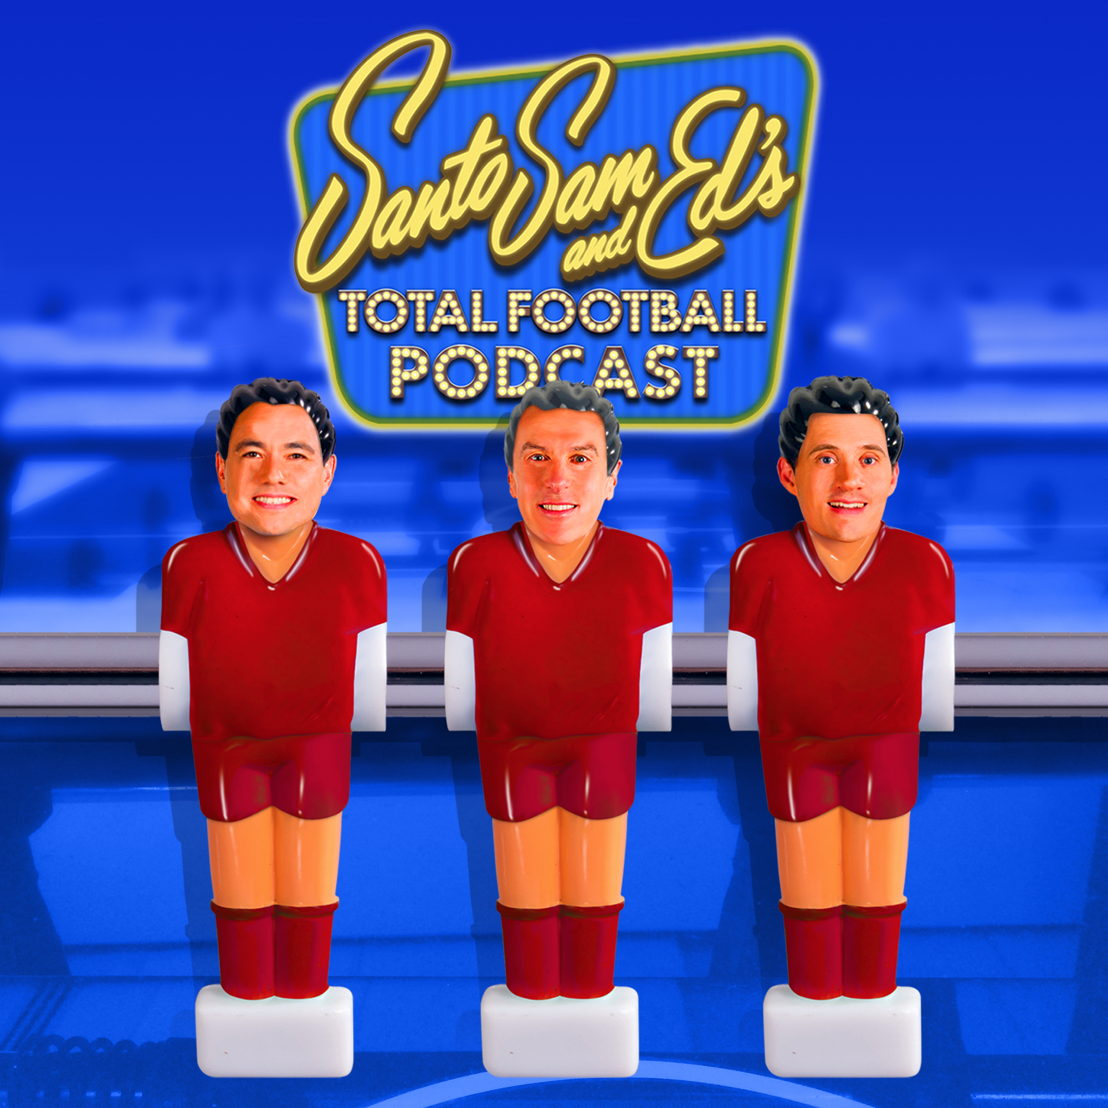 Santo, Sam and Ed's Total Football Podcast